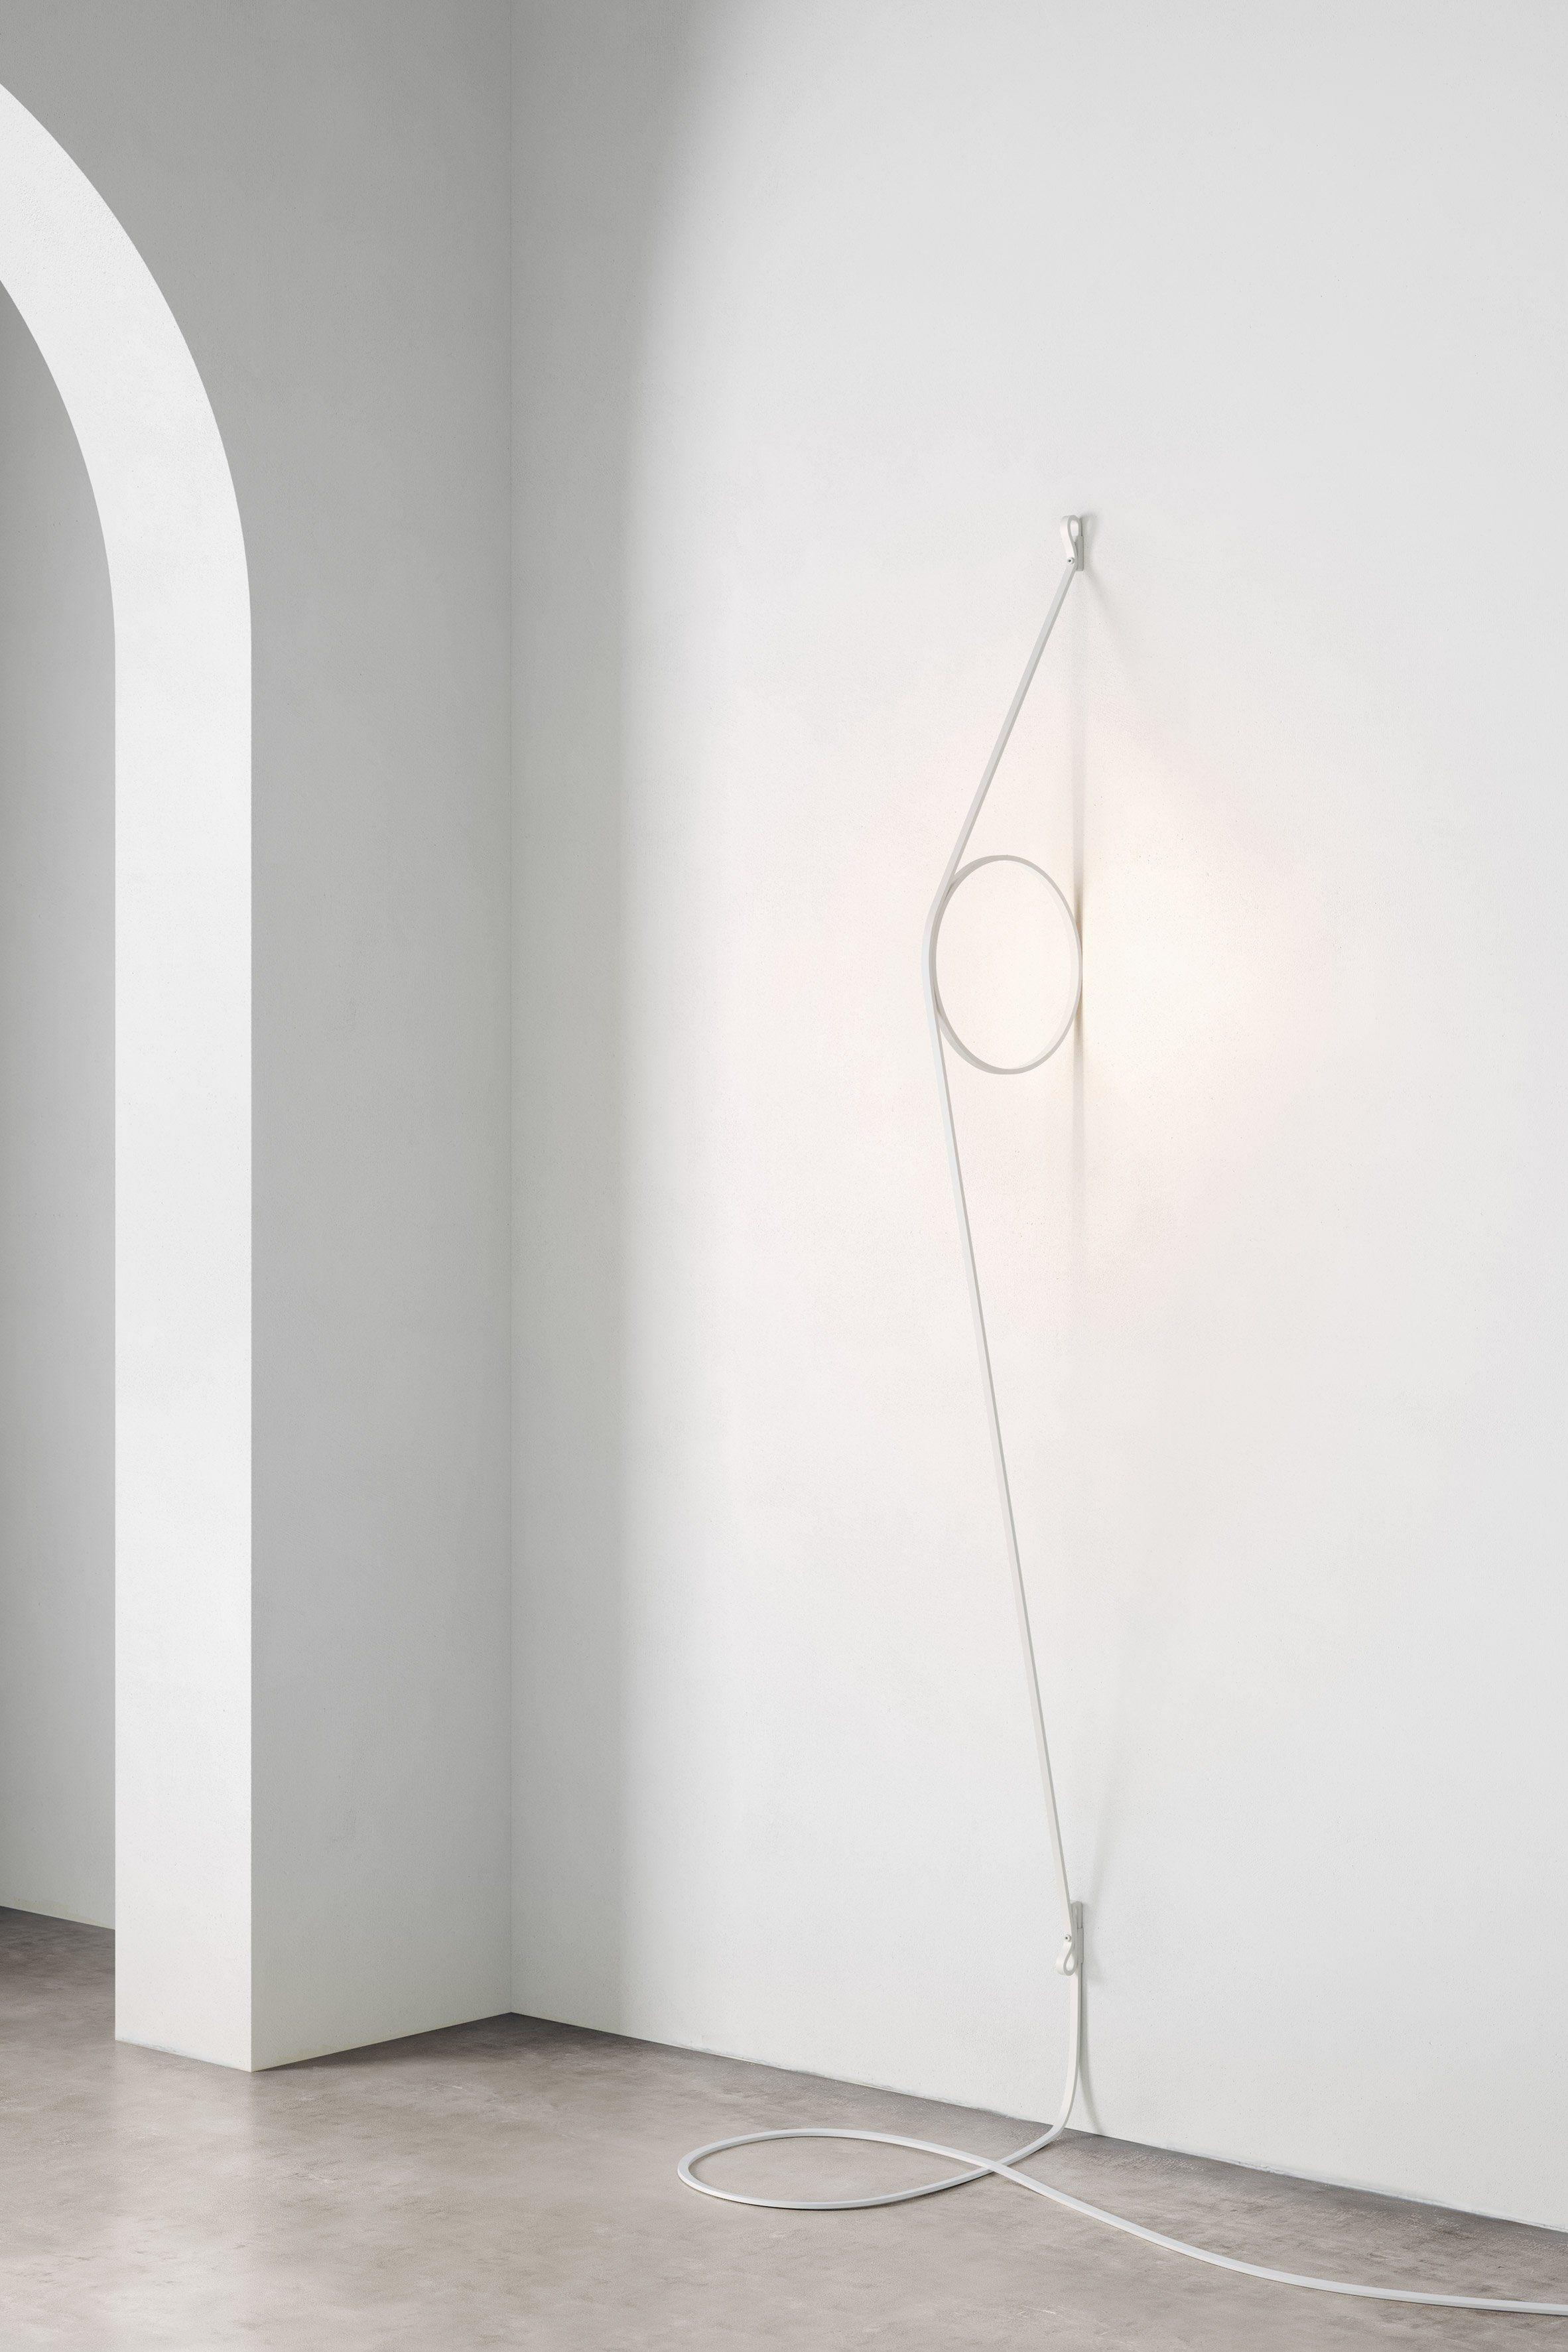 Milan Blush Lamp And Wire Ring By Formafantasma For Flos Lamp Design Flos Lamp Flos